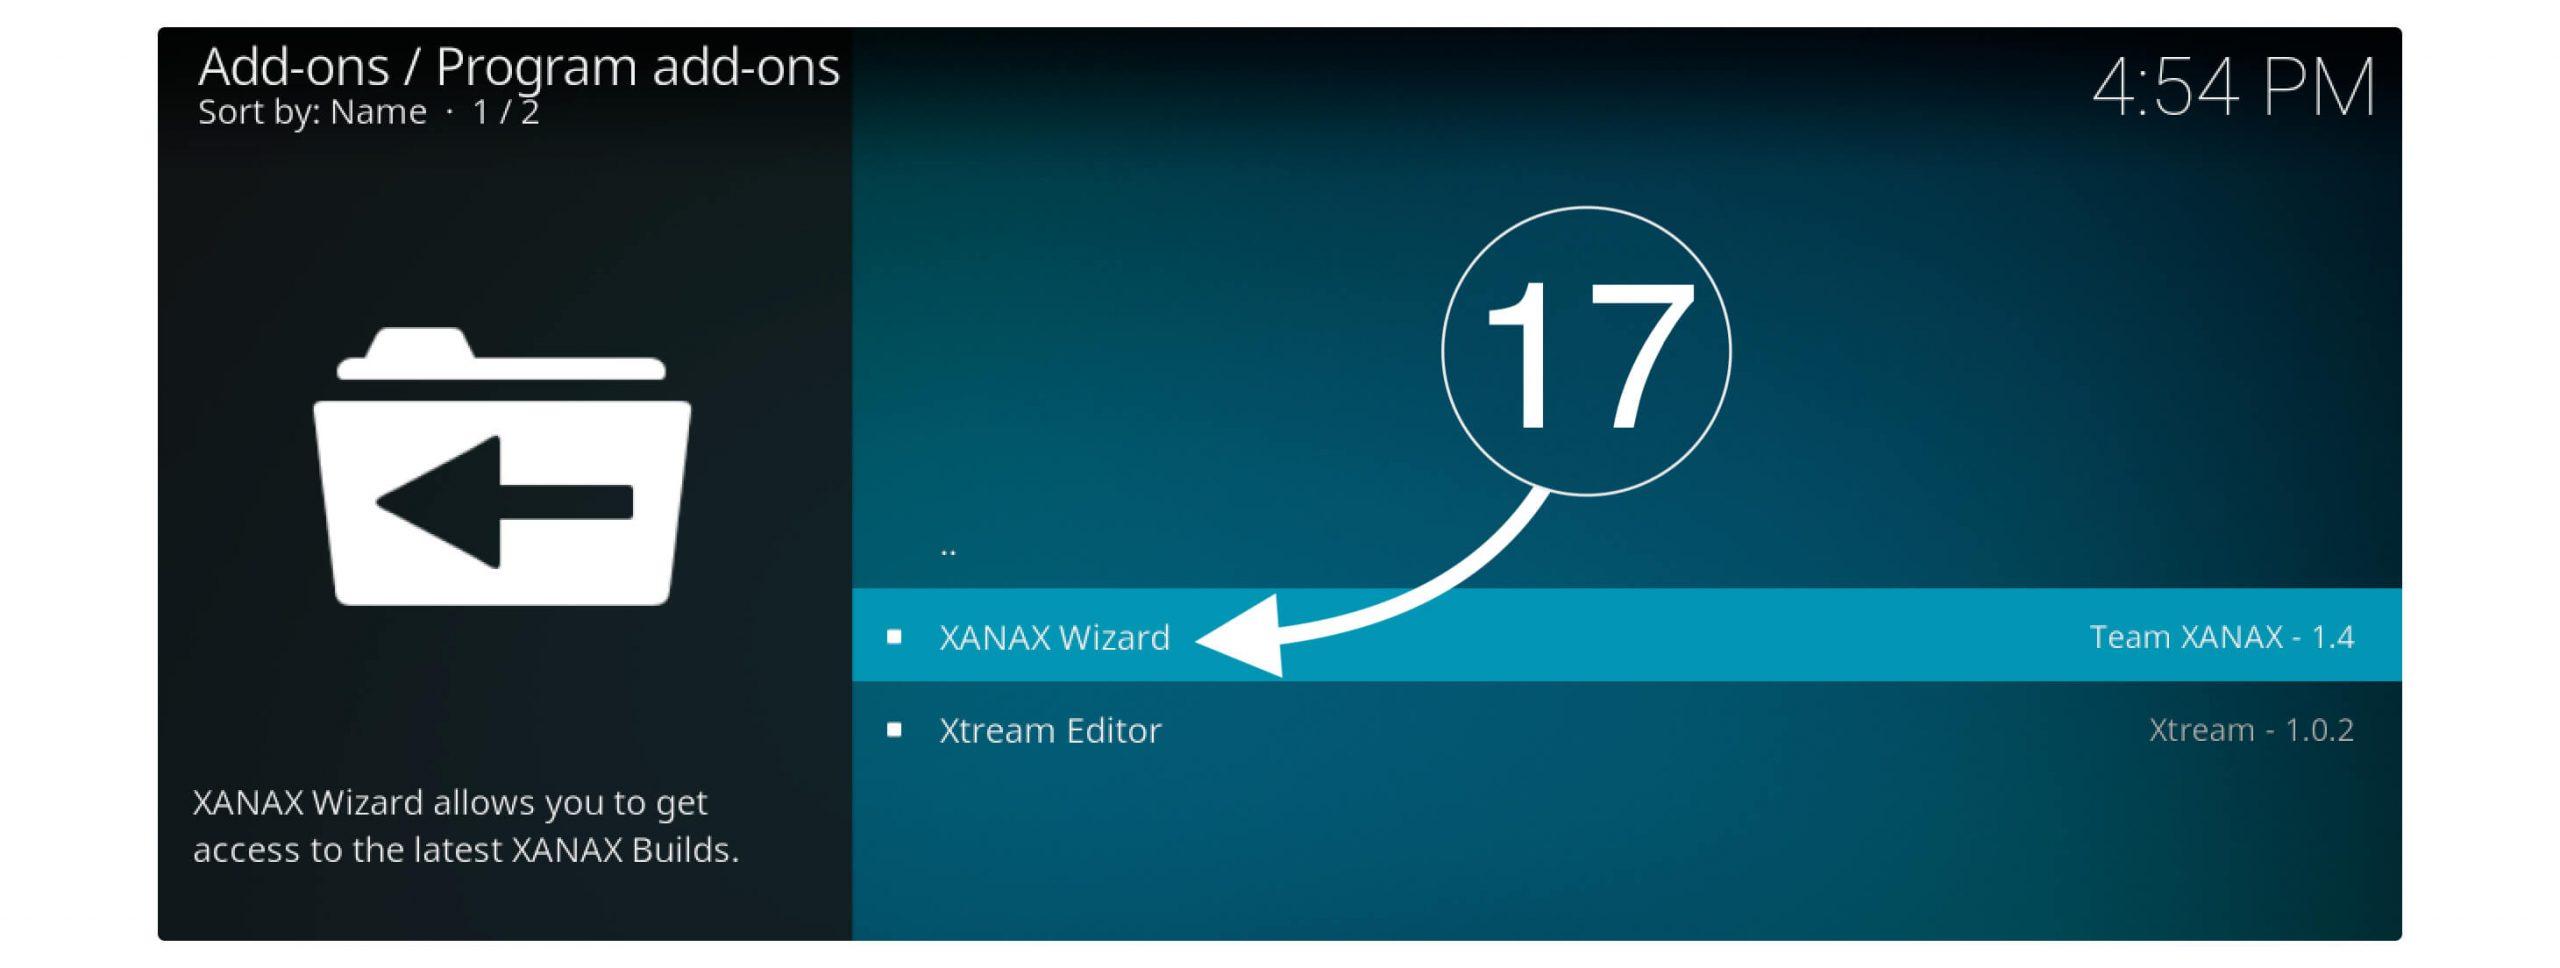 How-To-Install-Kodi-Addon-Xanax